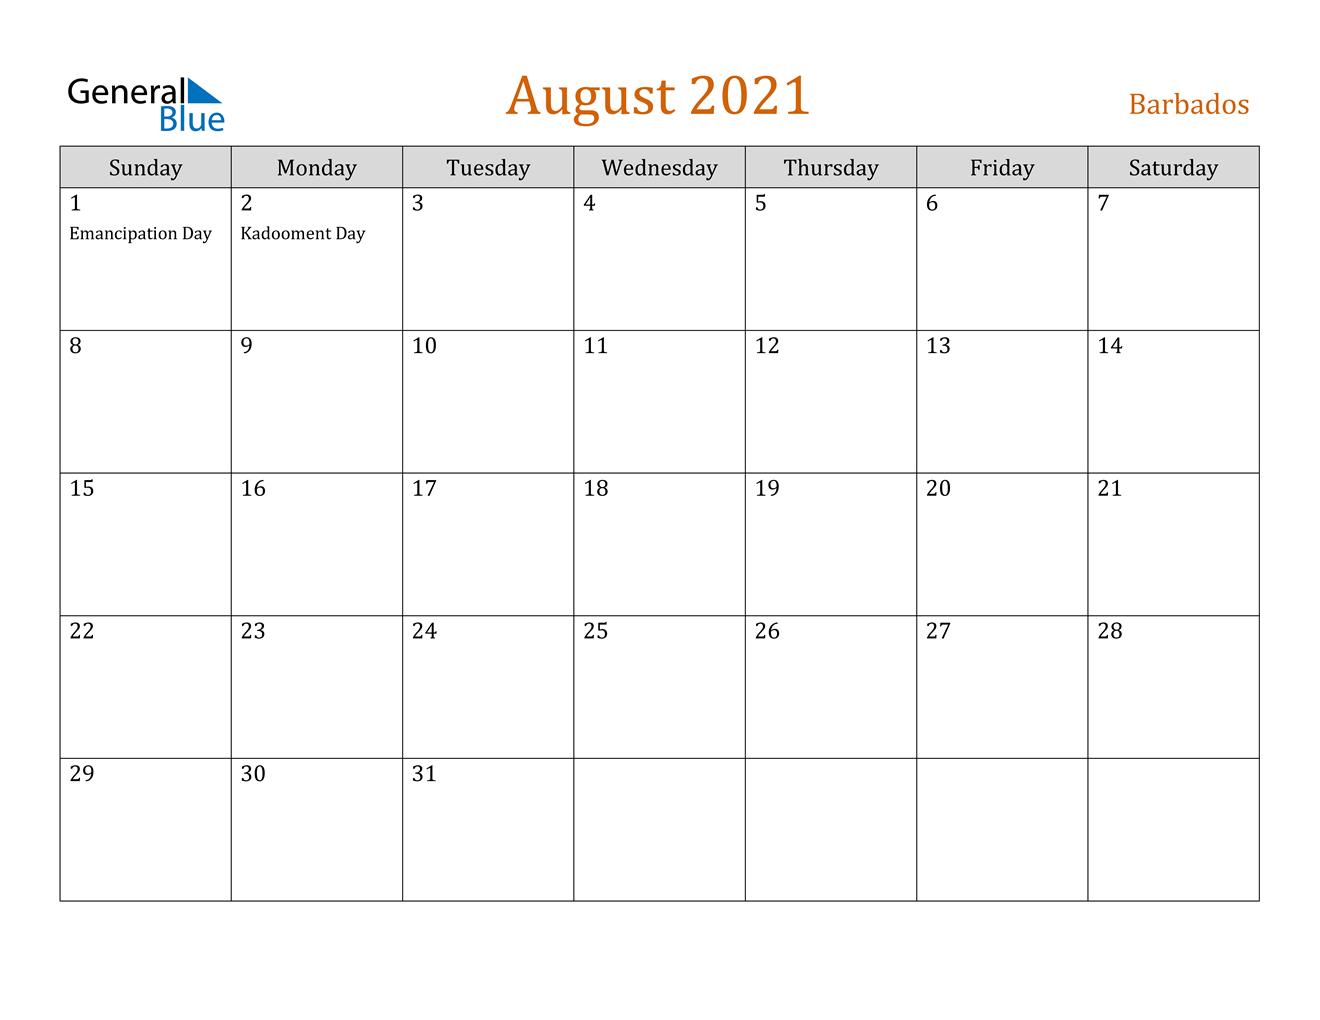 August 2021 Calendar Barbados